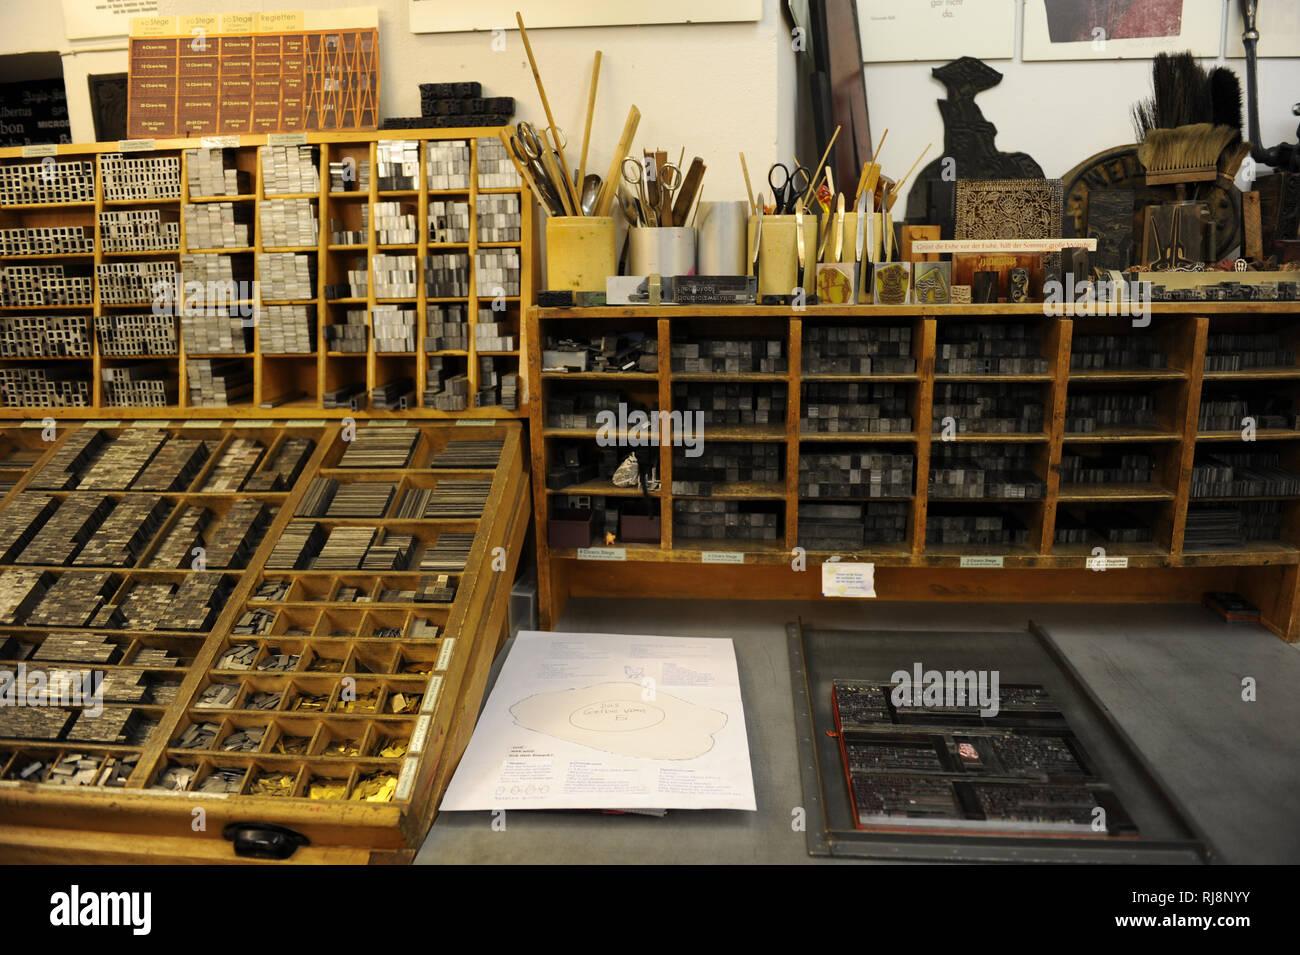 Druckerei, Innenaufnahme - Stock Image